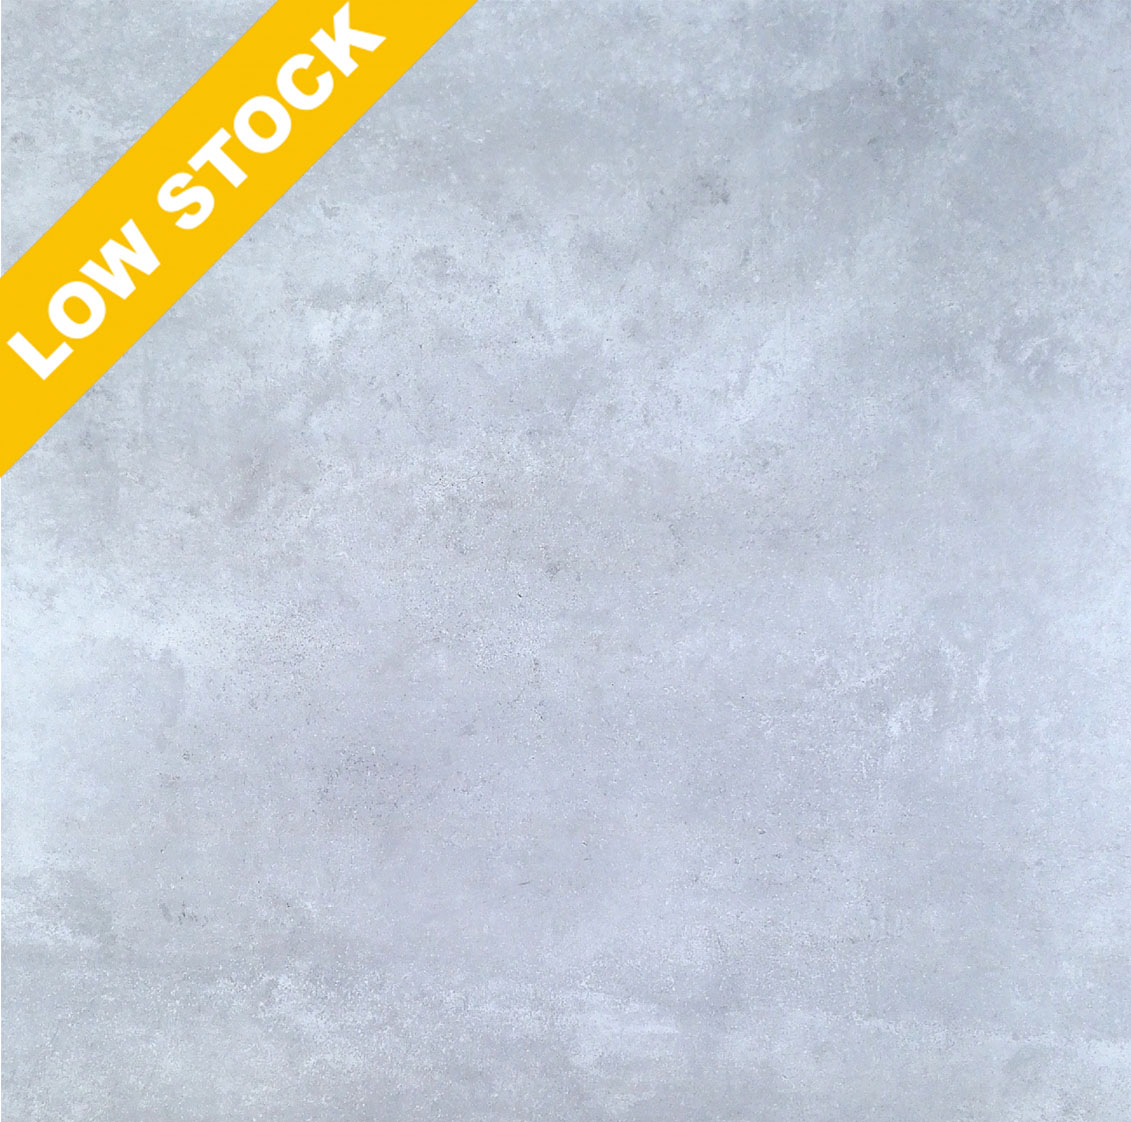 600X600 trust grey matt glazed porcelain Image